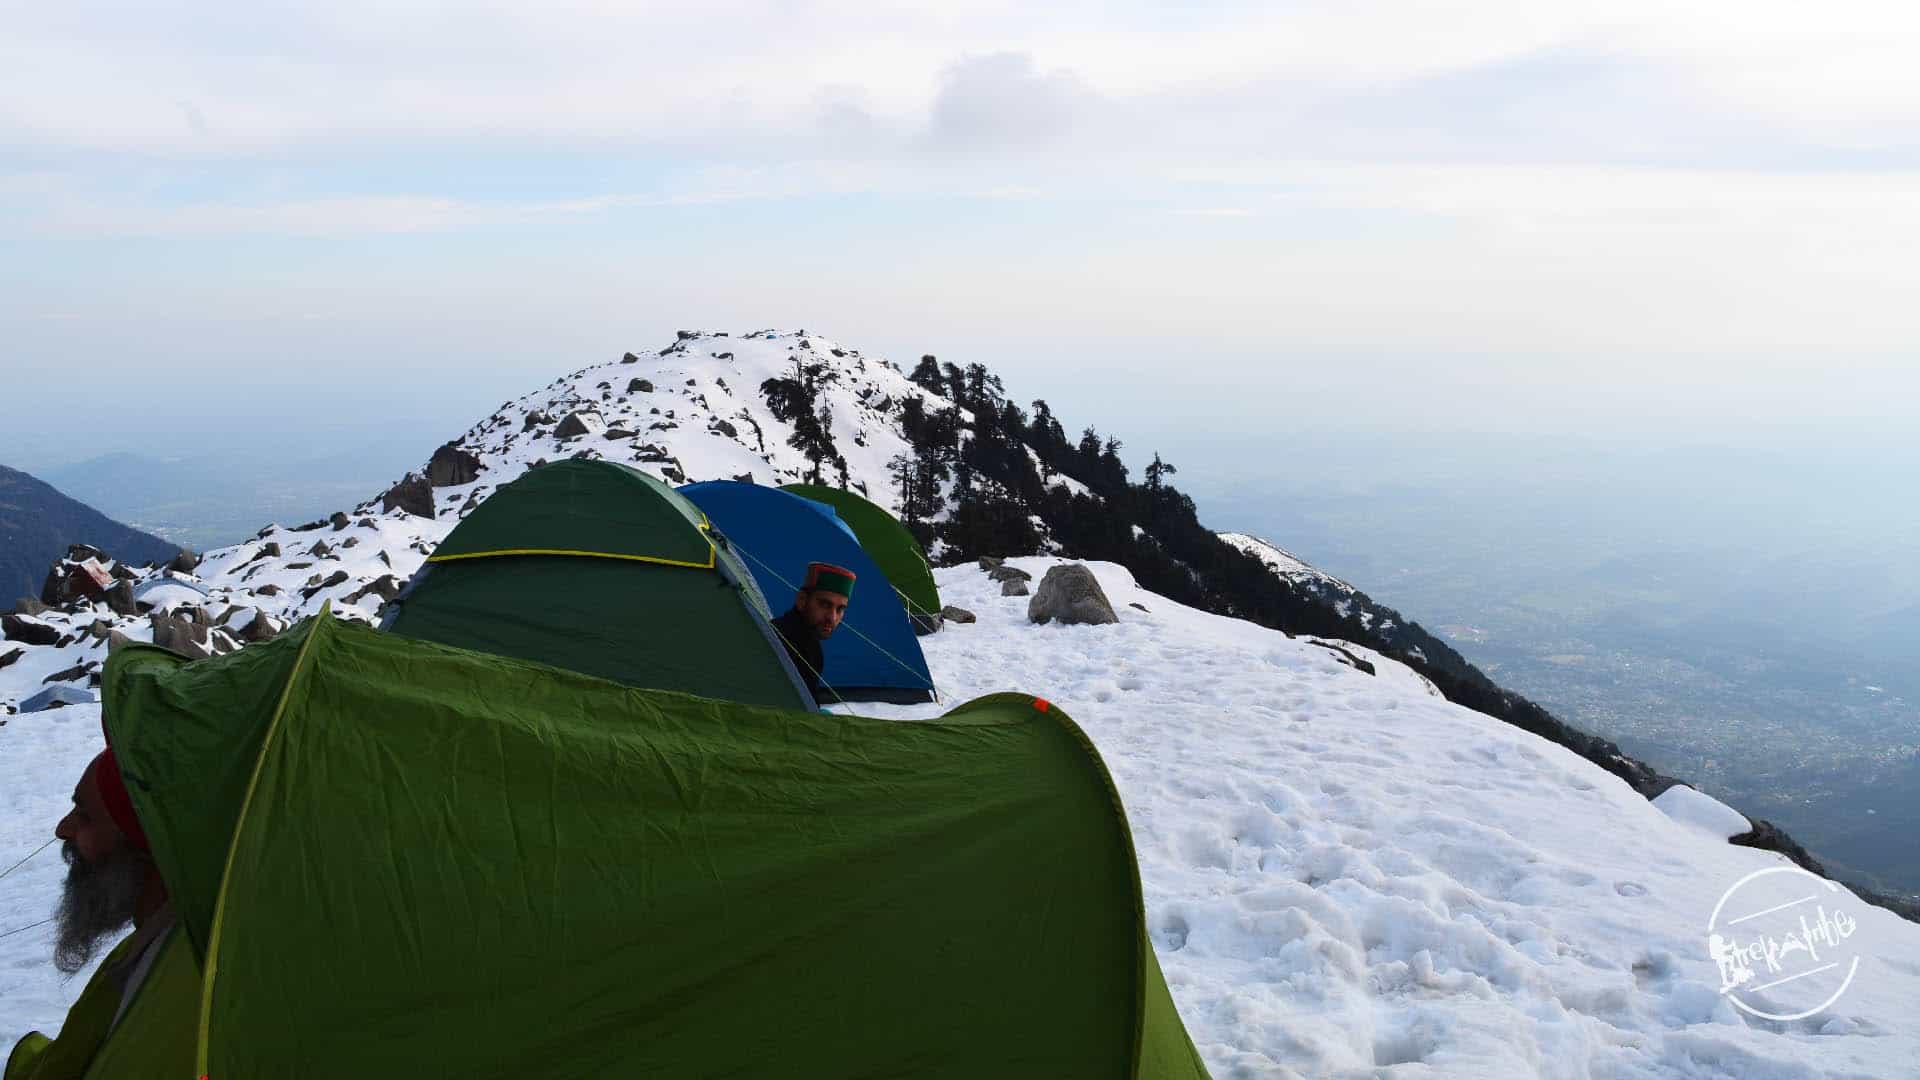 Snow Trek camping - Triund - Trekatribe